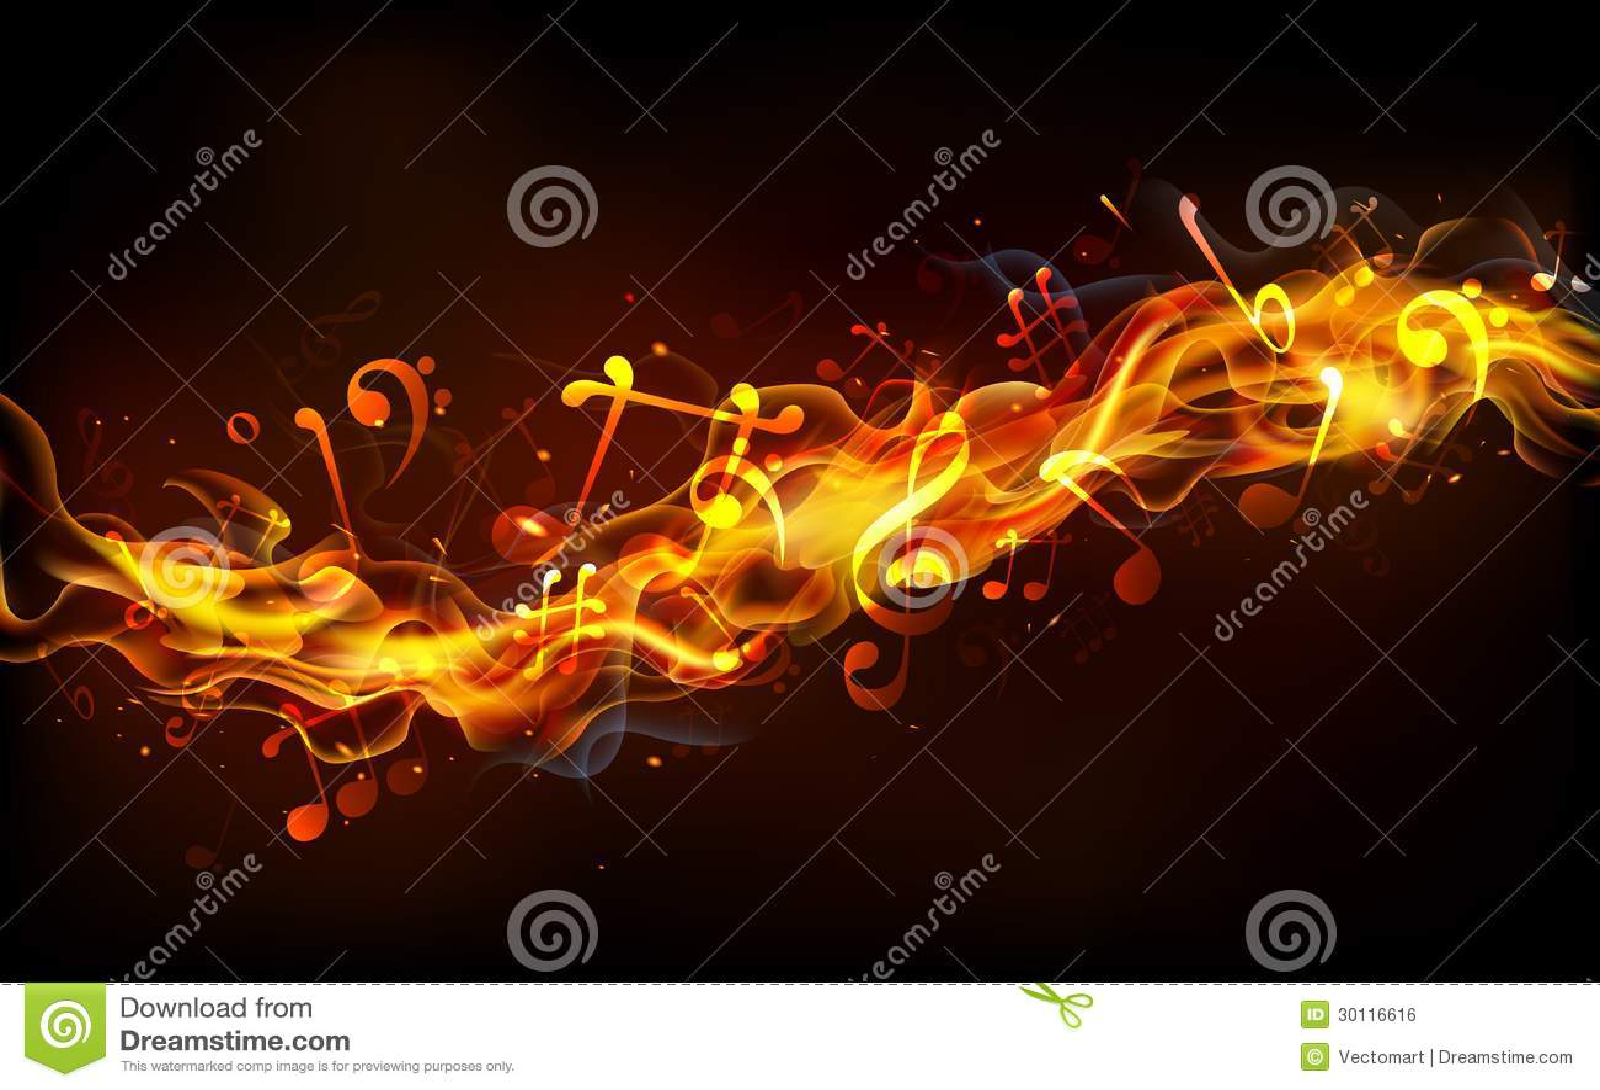 Fiery Treble Clef In Rainbow Flames: Fiery Music Royalty Free Stock Image